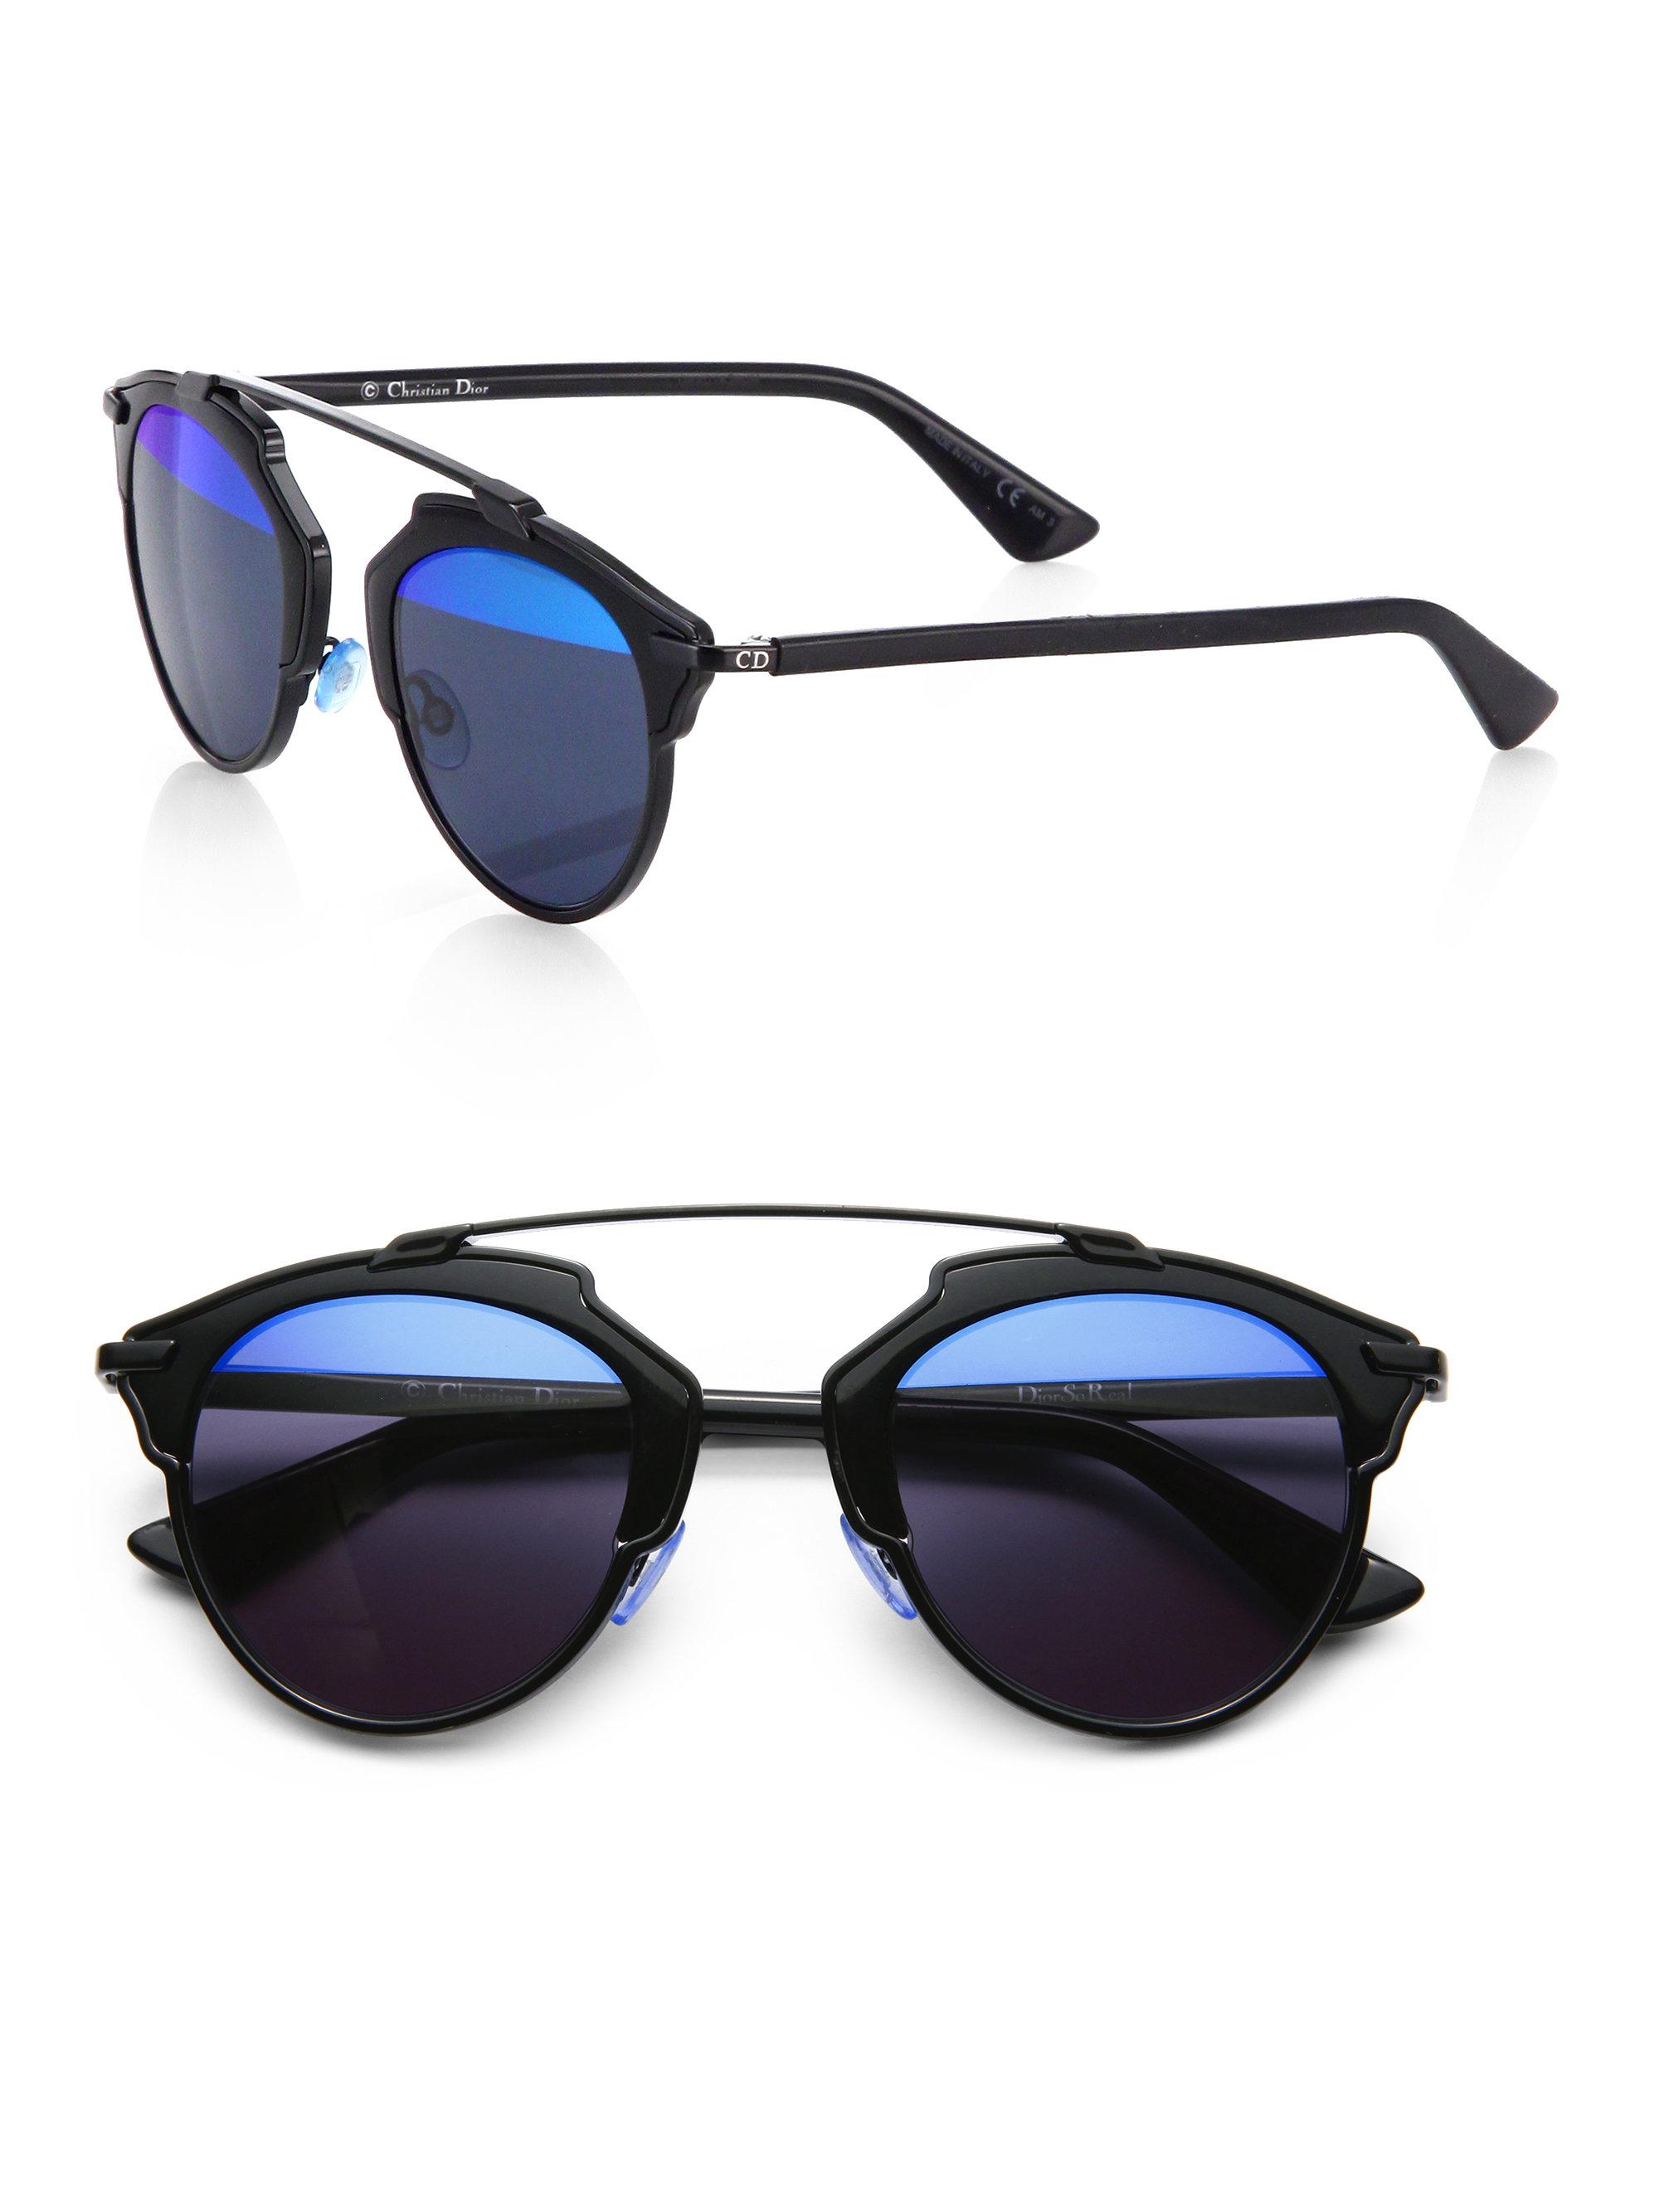 f40c6623b1b Ebay Dior So Real 48mm Sunglasses - Bitterroot Public Library